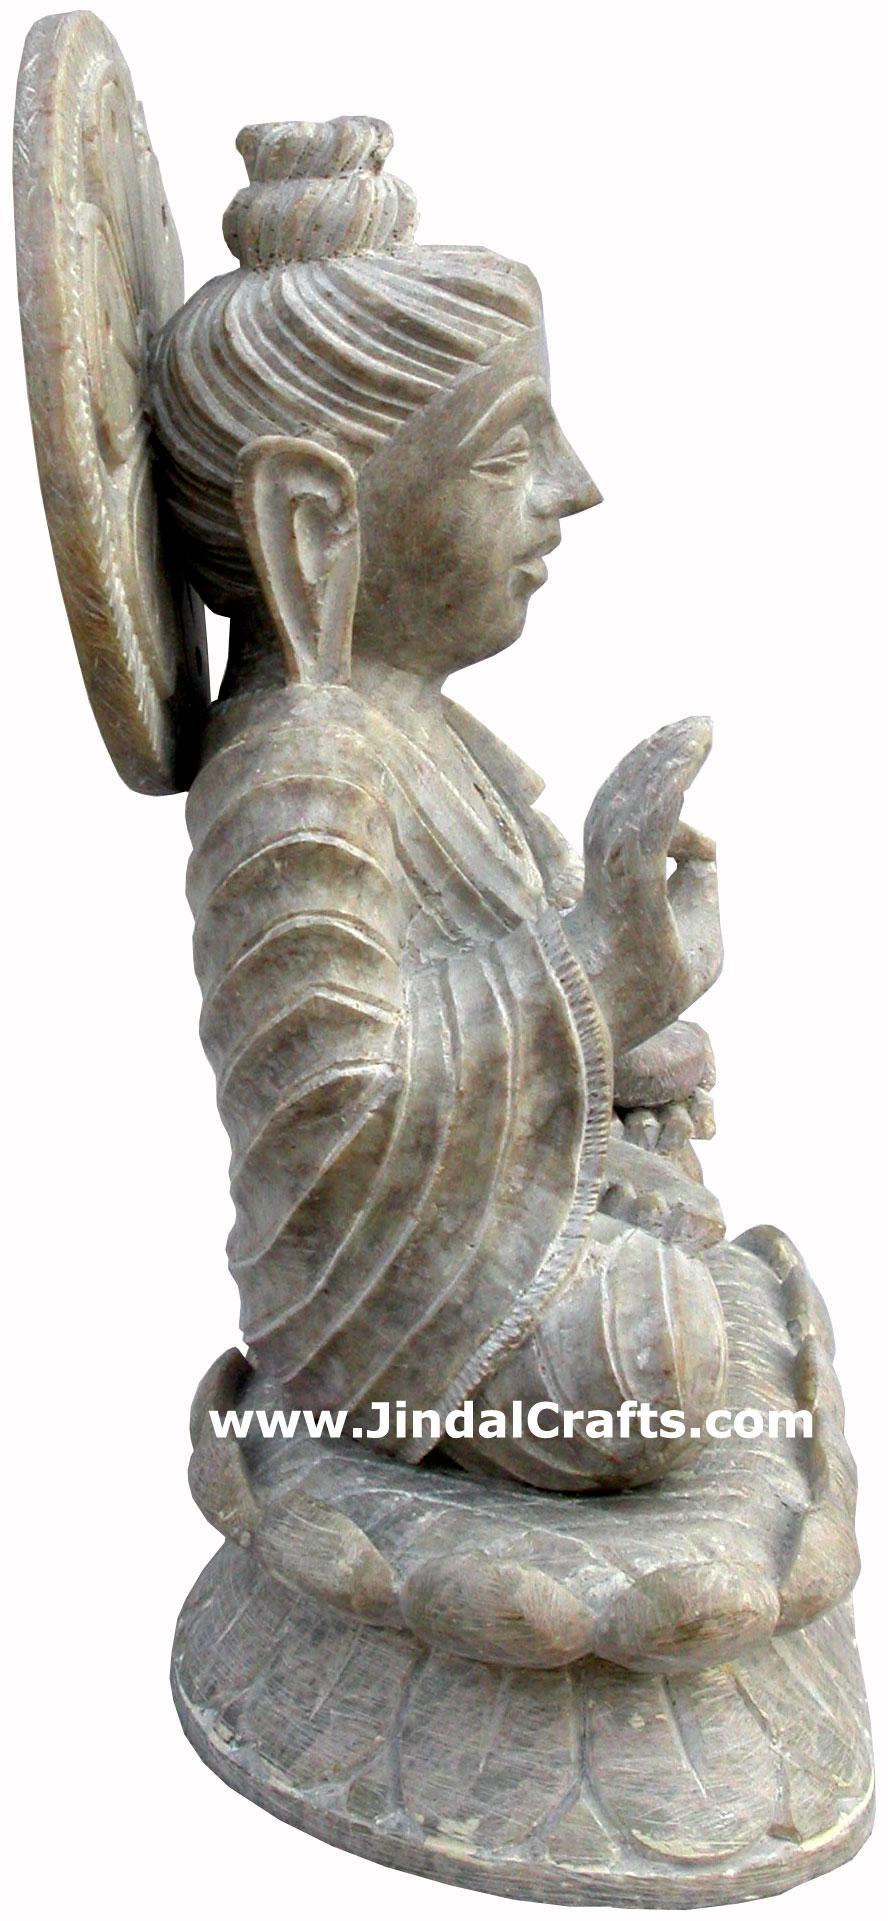 Lord Buddha Hand Carved Indian Art Craft Handicrafts Home Decor Stone Figurines